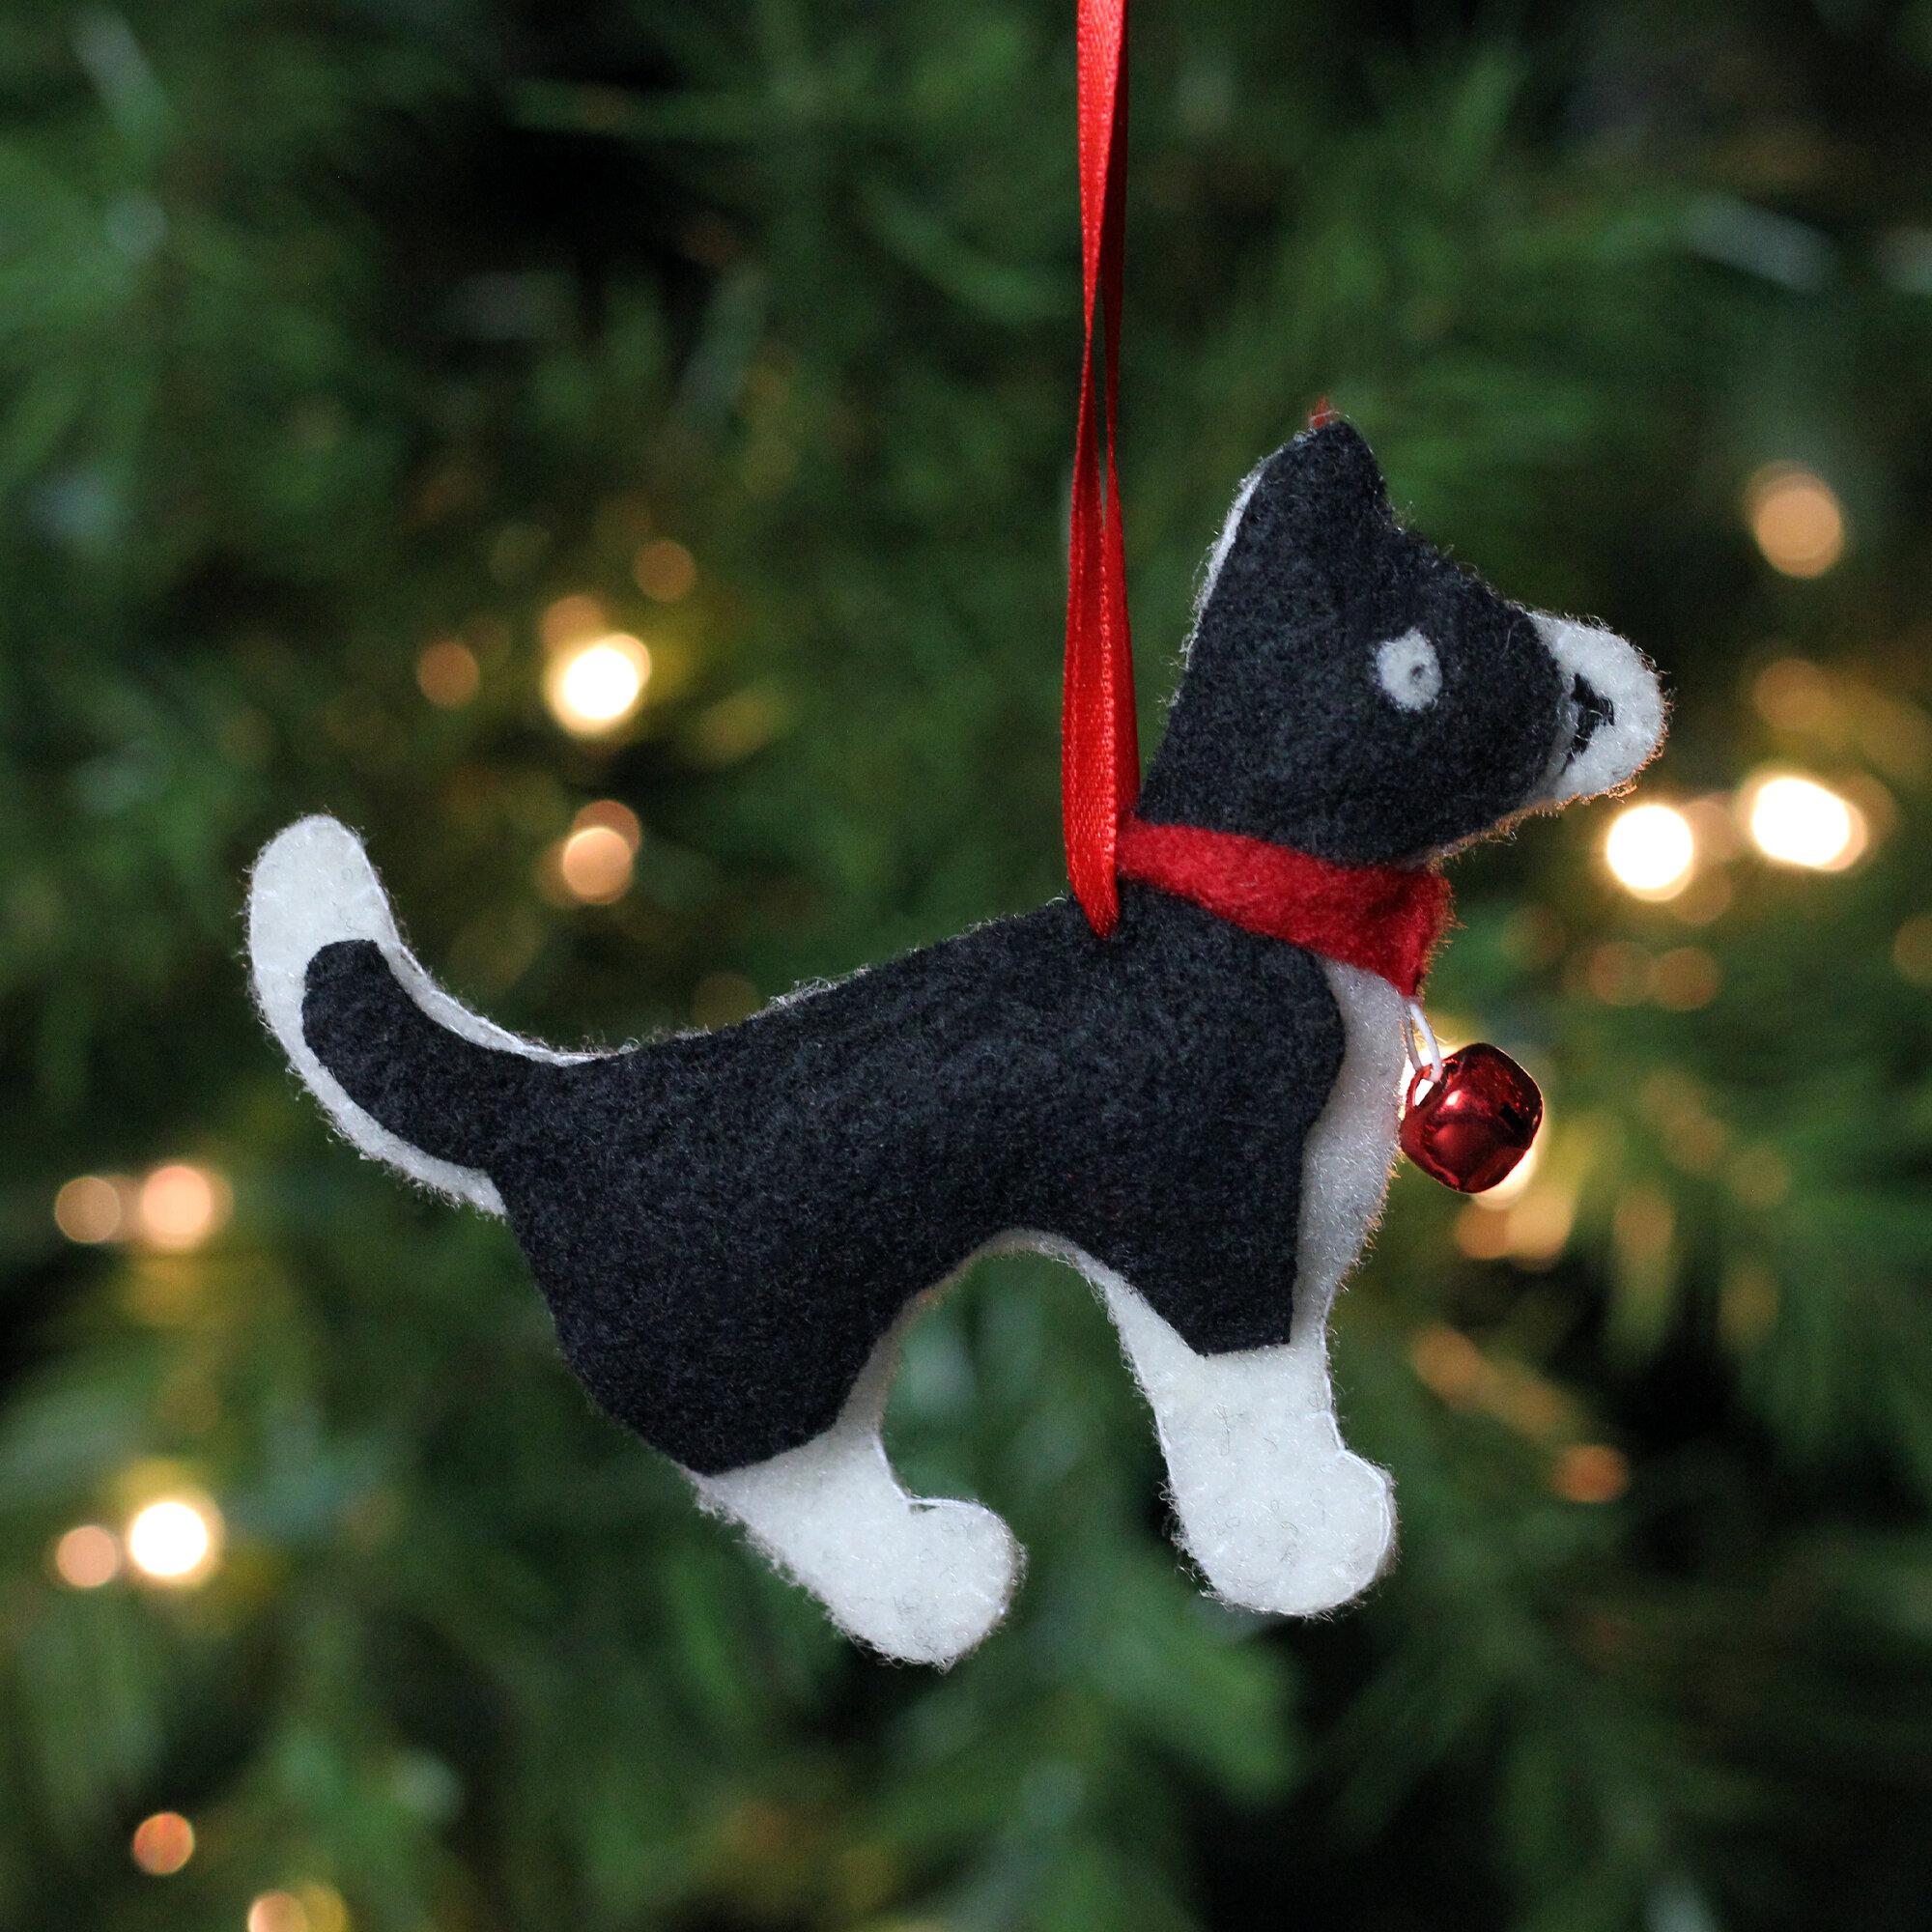 Northlight 4 72 Cream And Black Dog Plush Christmas Ornament Wayfair